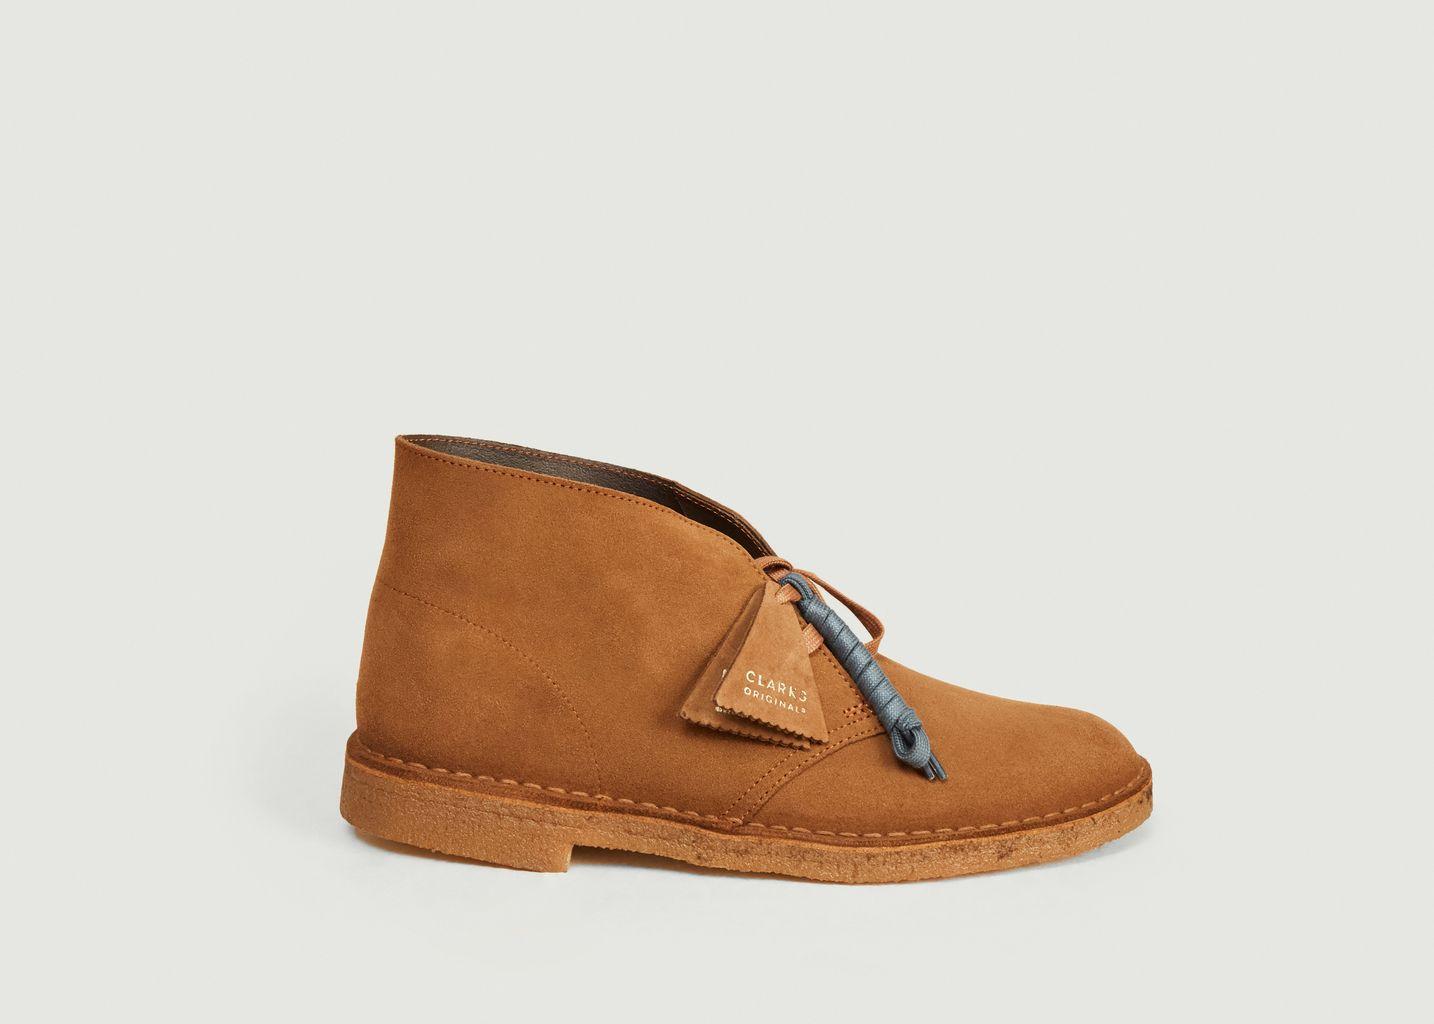 Desert boots cola suede - Clarks Originals